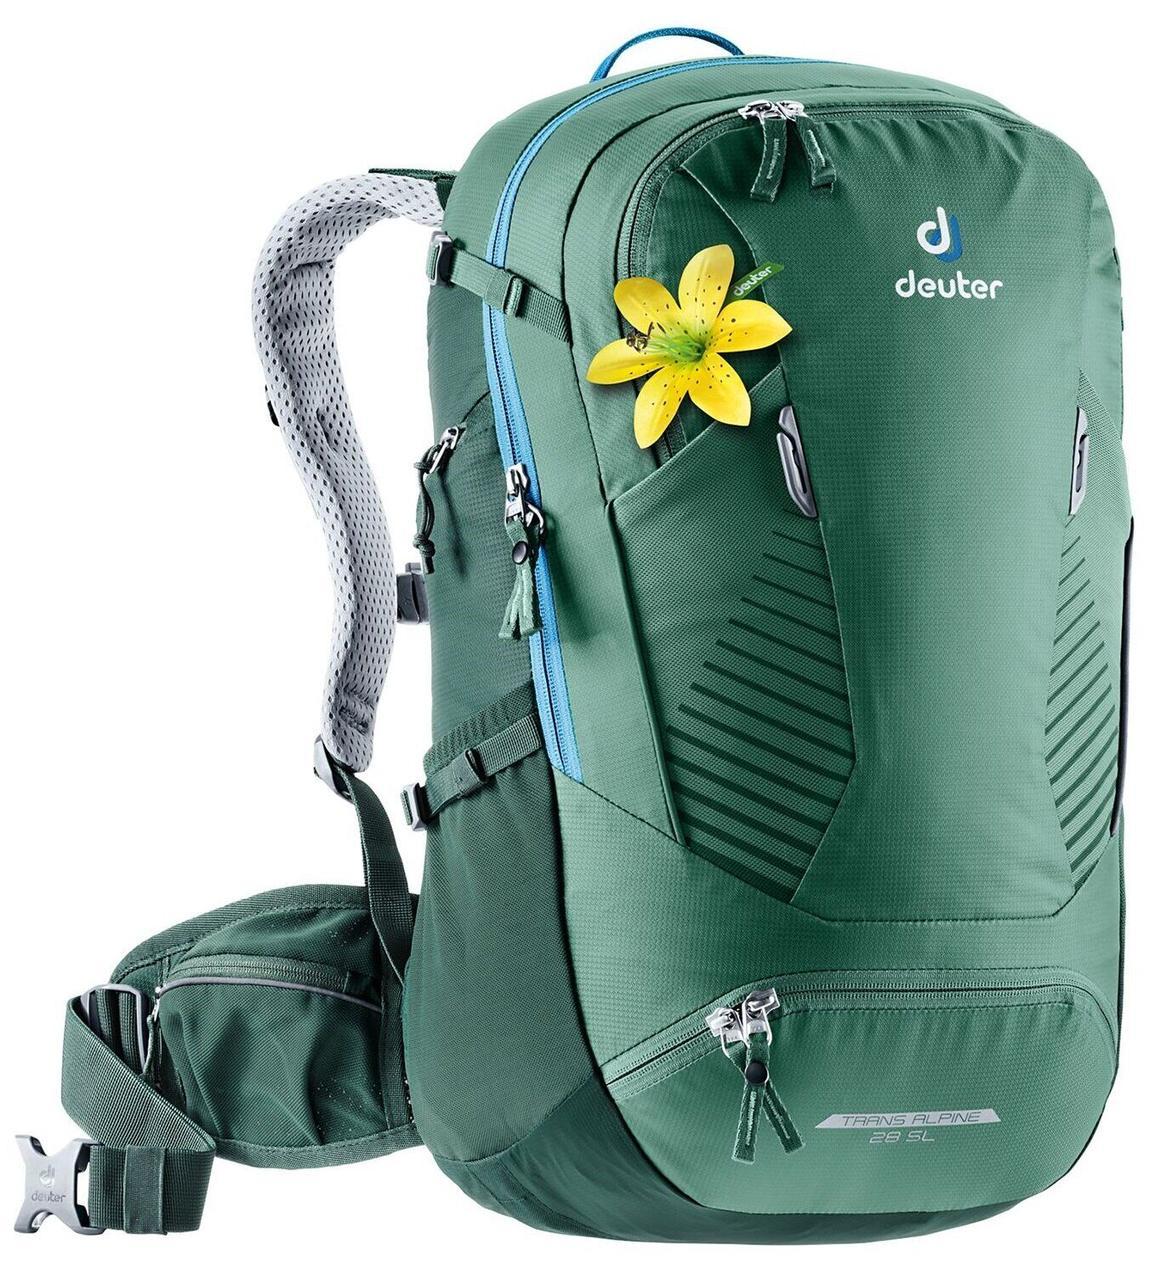 Велорюкзак Deuter Trans Alpine 28 SL seagreen-forest (3205120 2247)